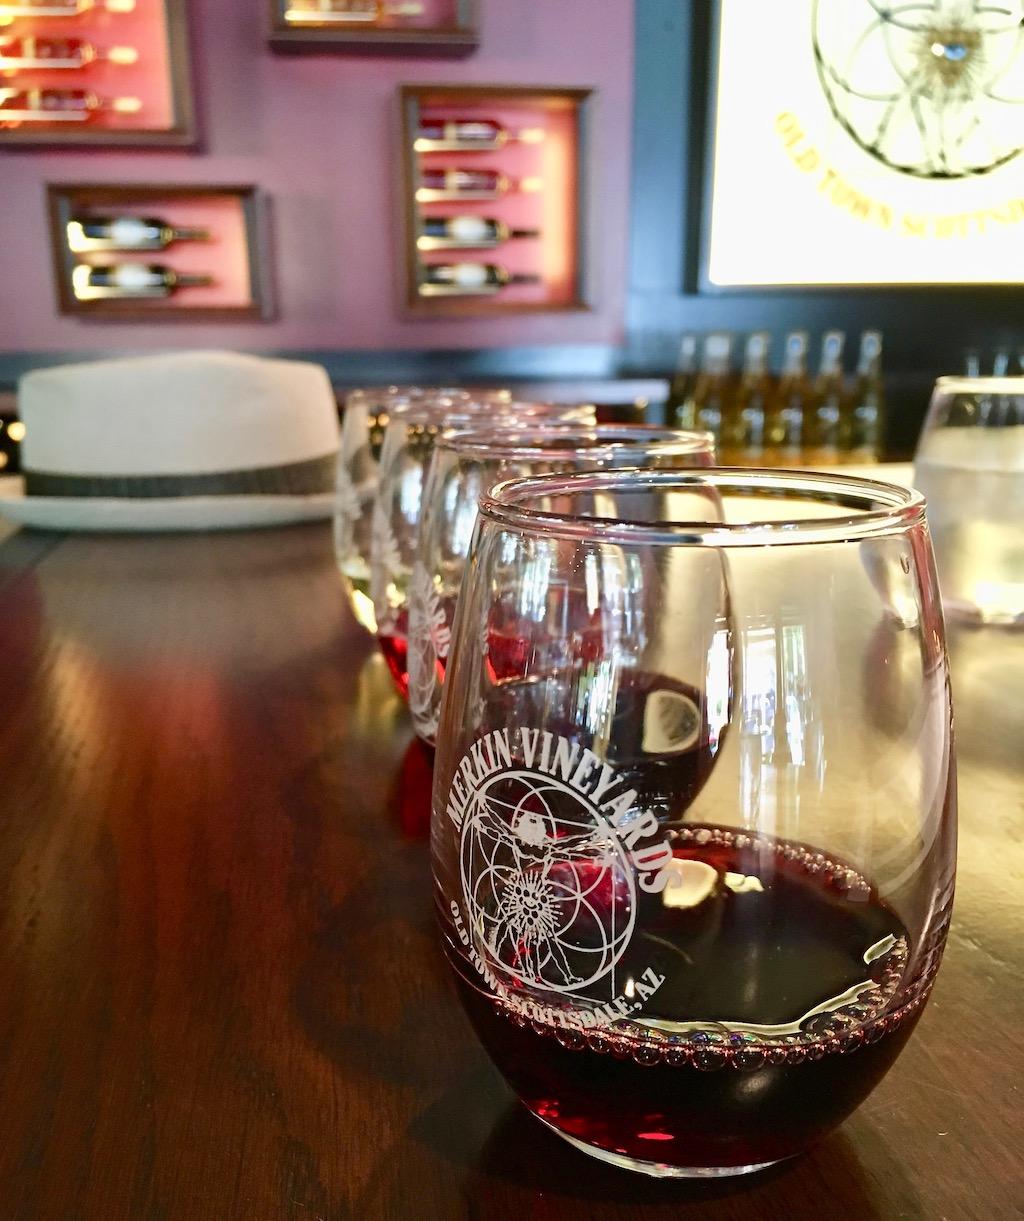 merkin vineyards wine tasting scottsdale arizona